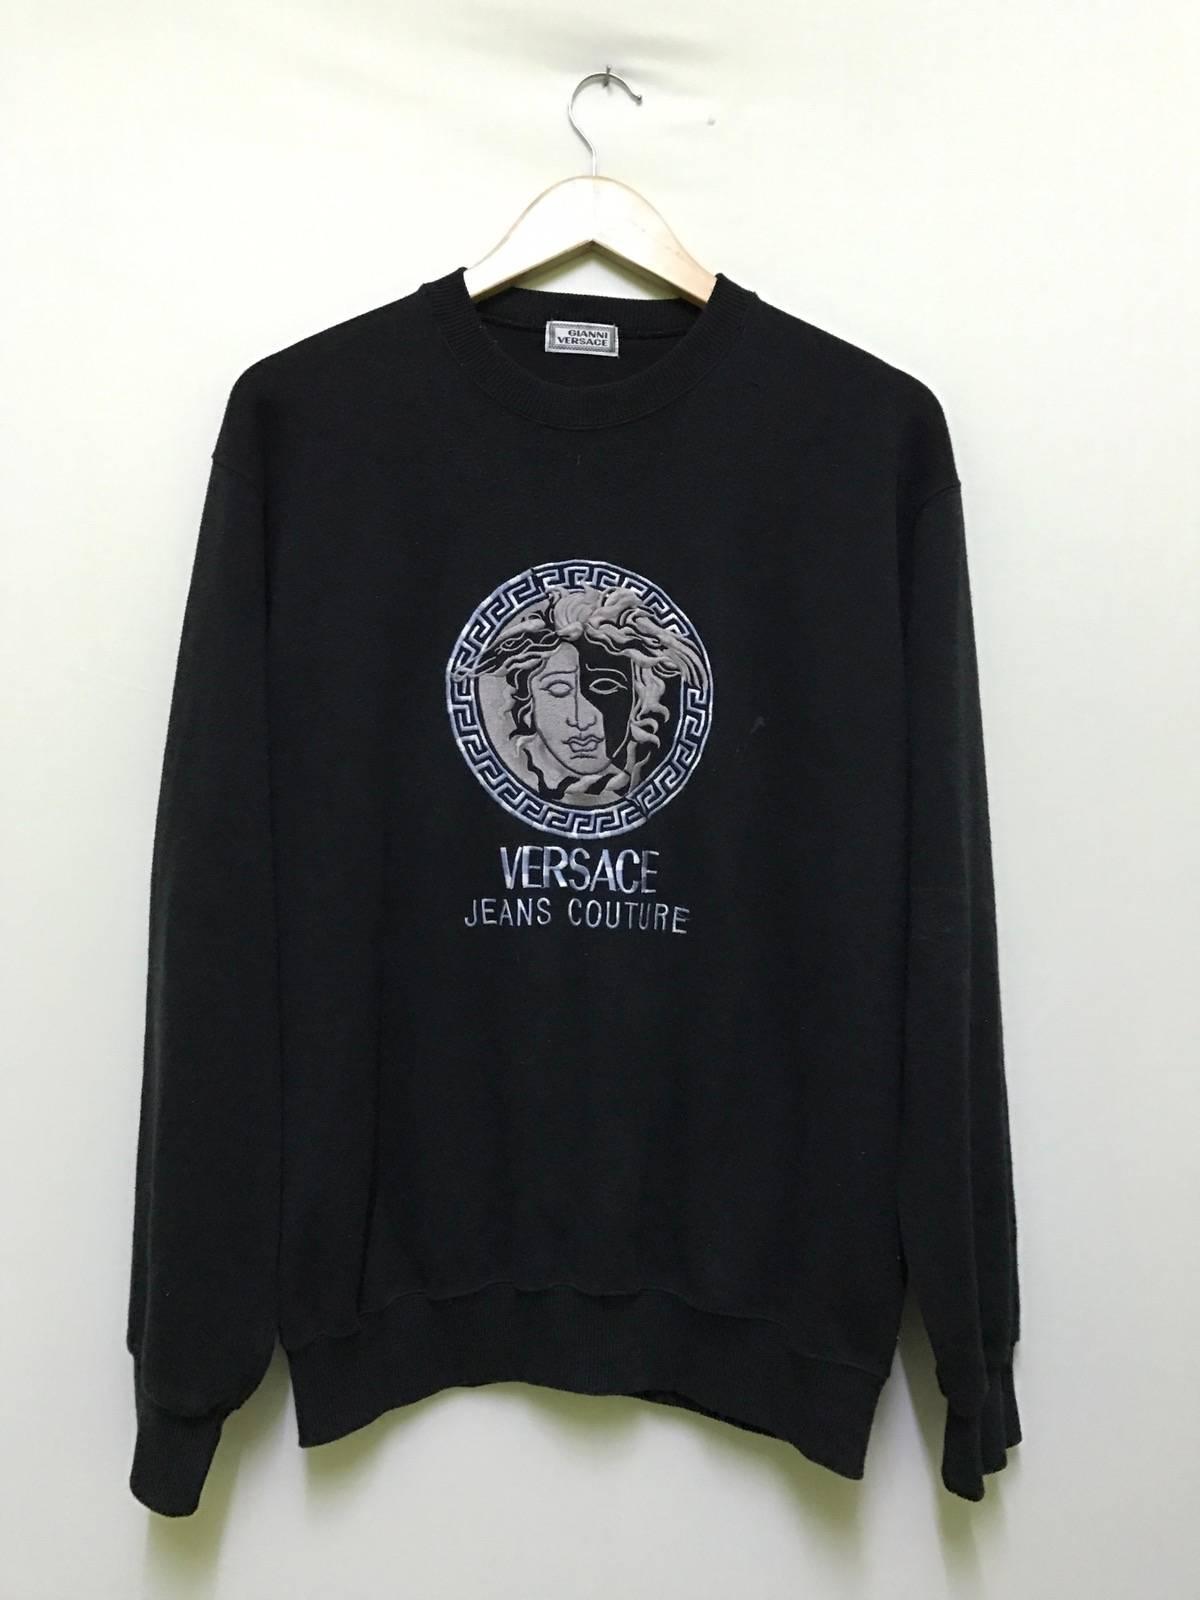 Rare!!! The Famous VERSACE JEANS COUTURE Medusa Embroidery Logo T-Shirt Black Colour Medium Size